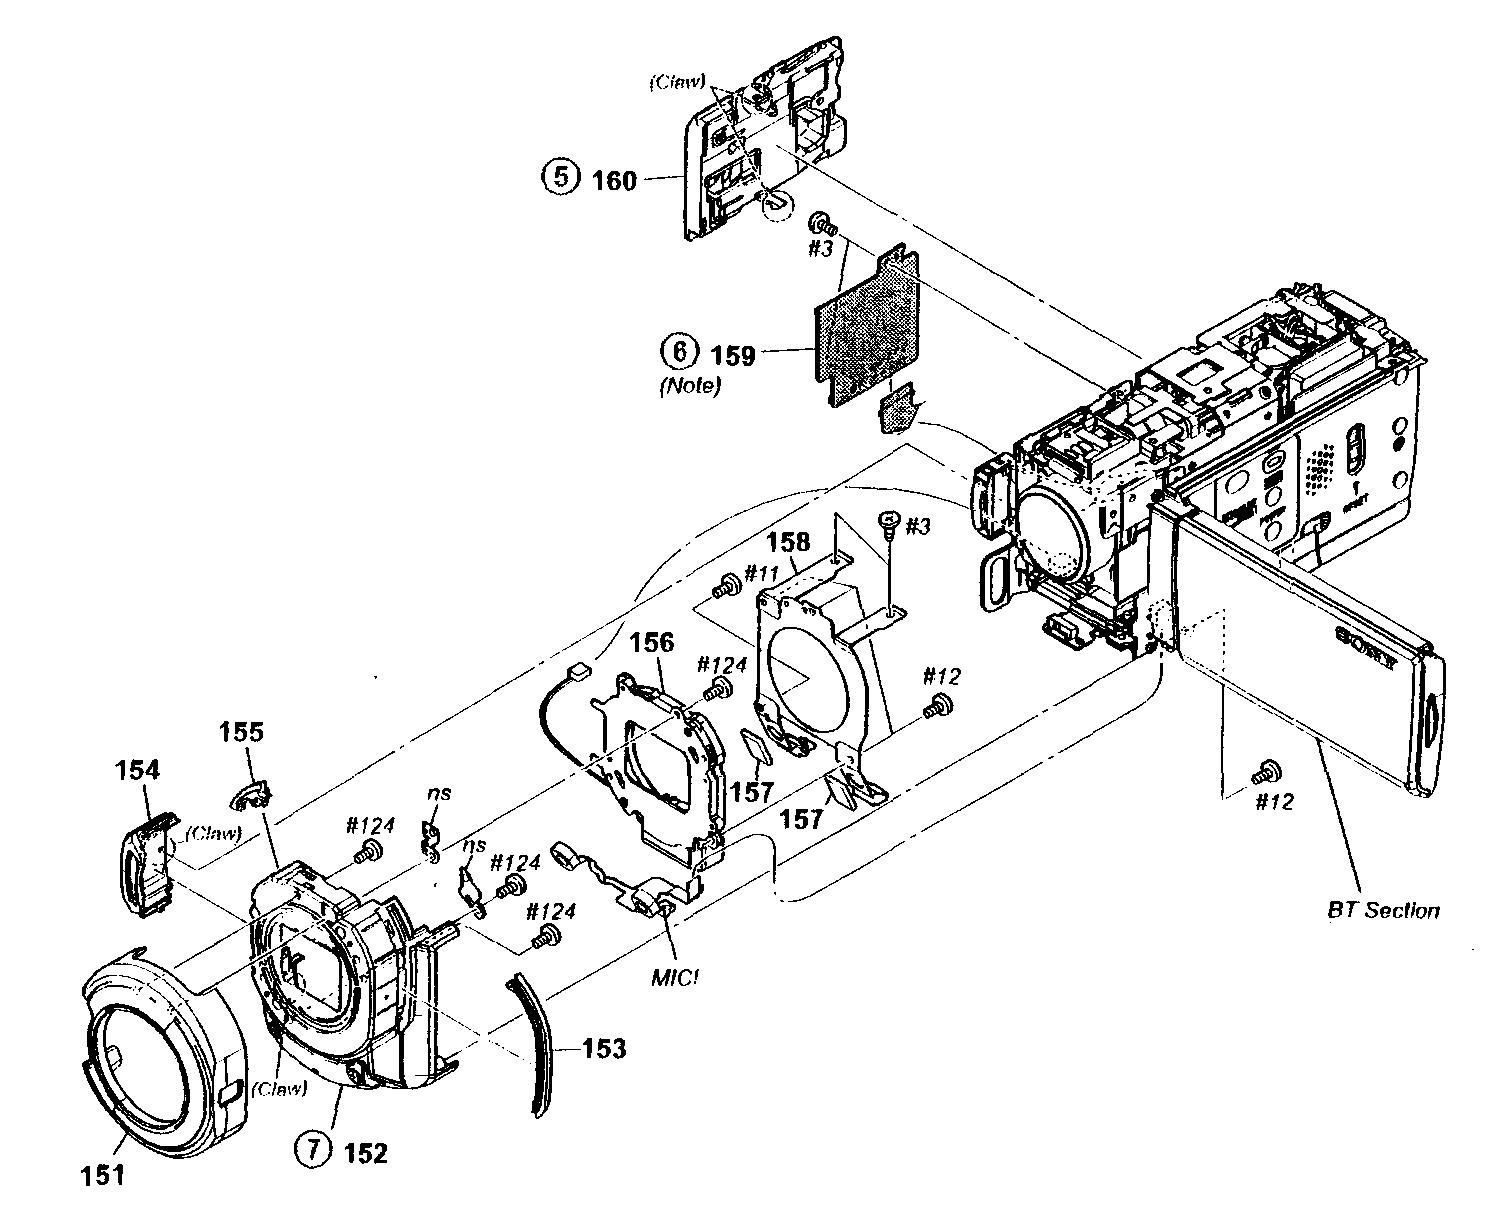 Sony model HDR-CX350V digital camcorder genuine parts